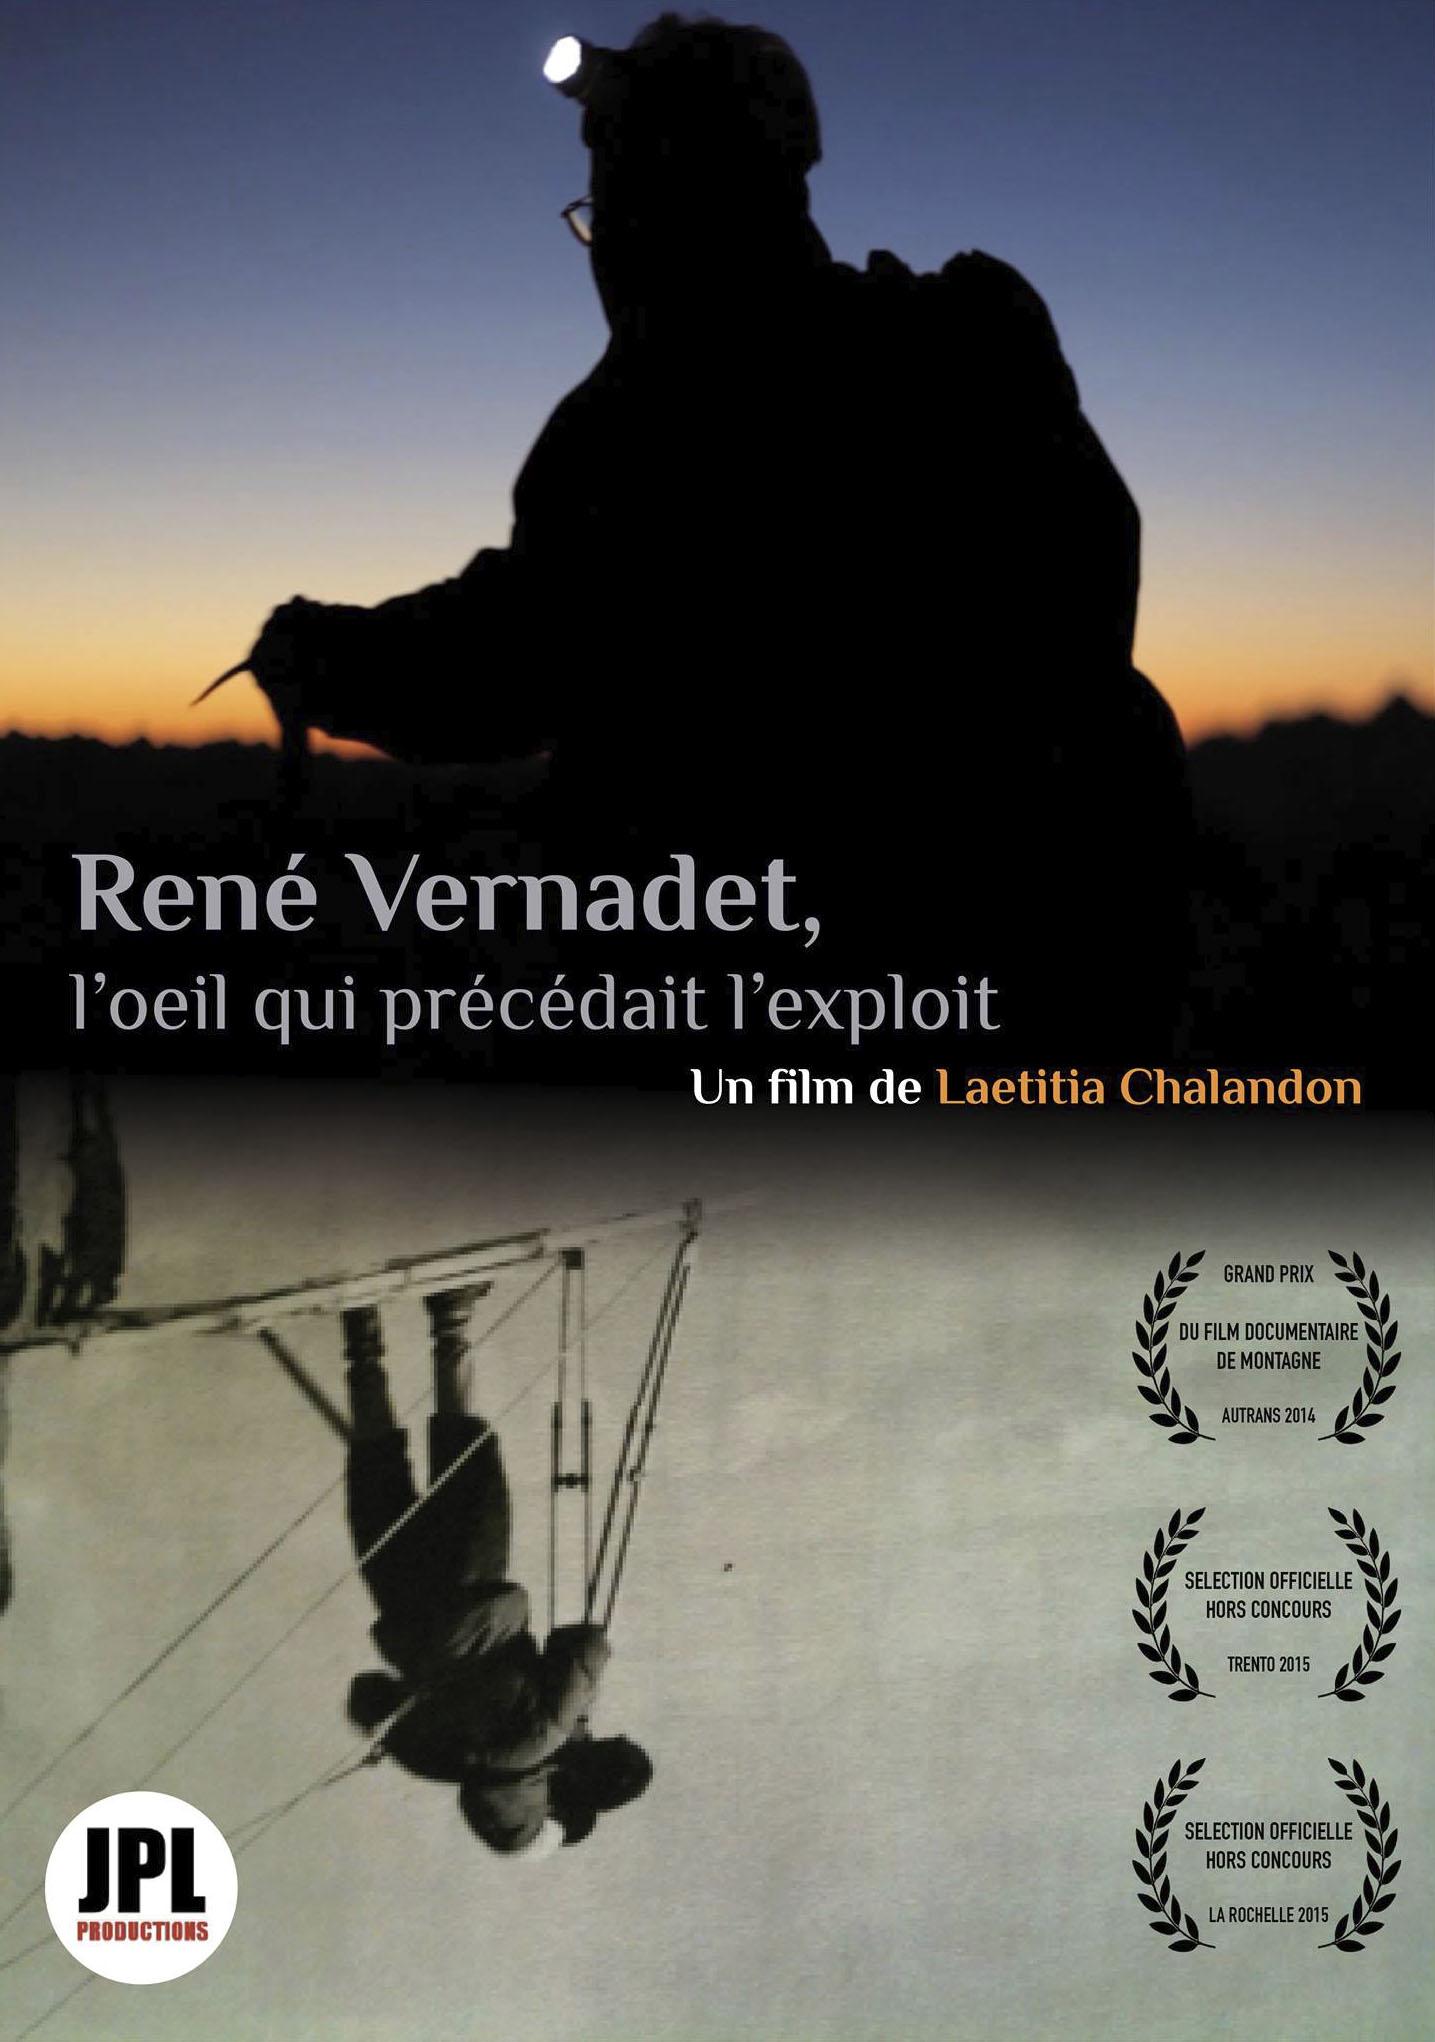 Rene-Vernadet-oeil-qui-precedait-exploit